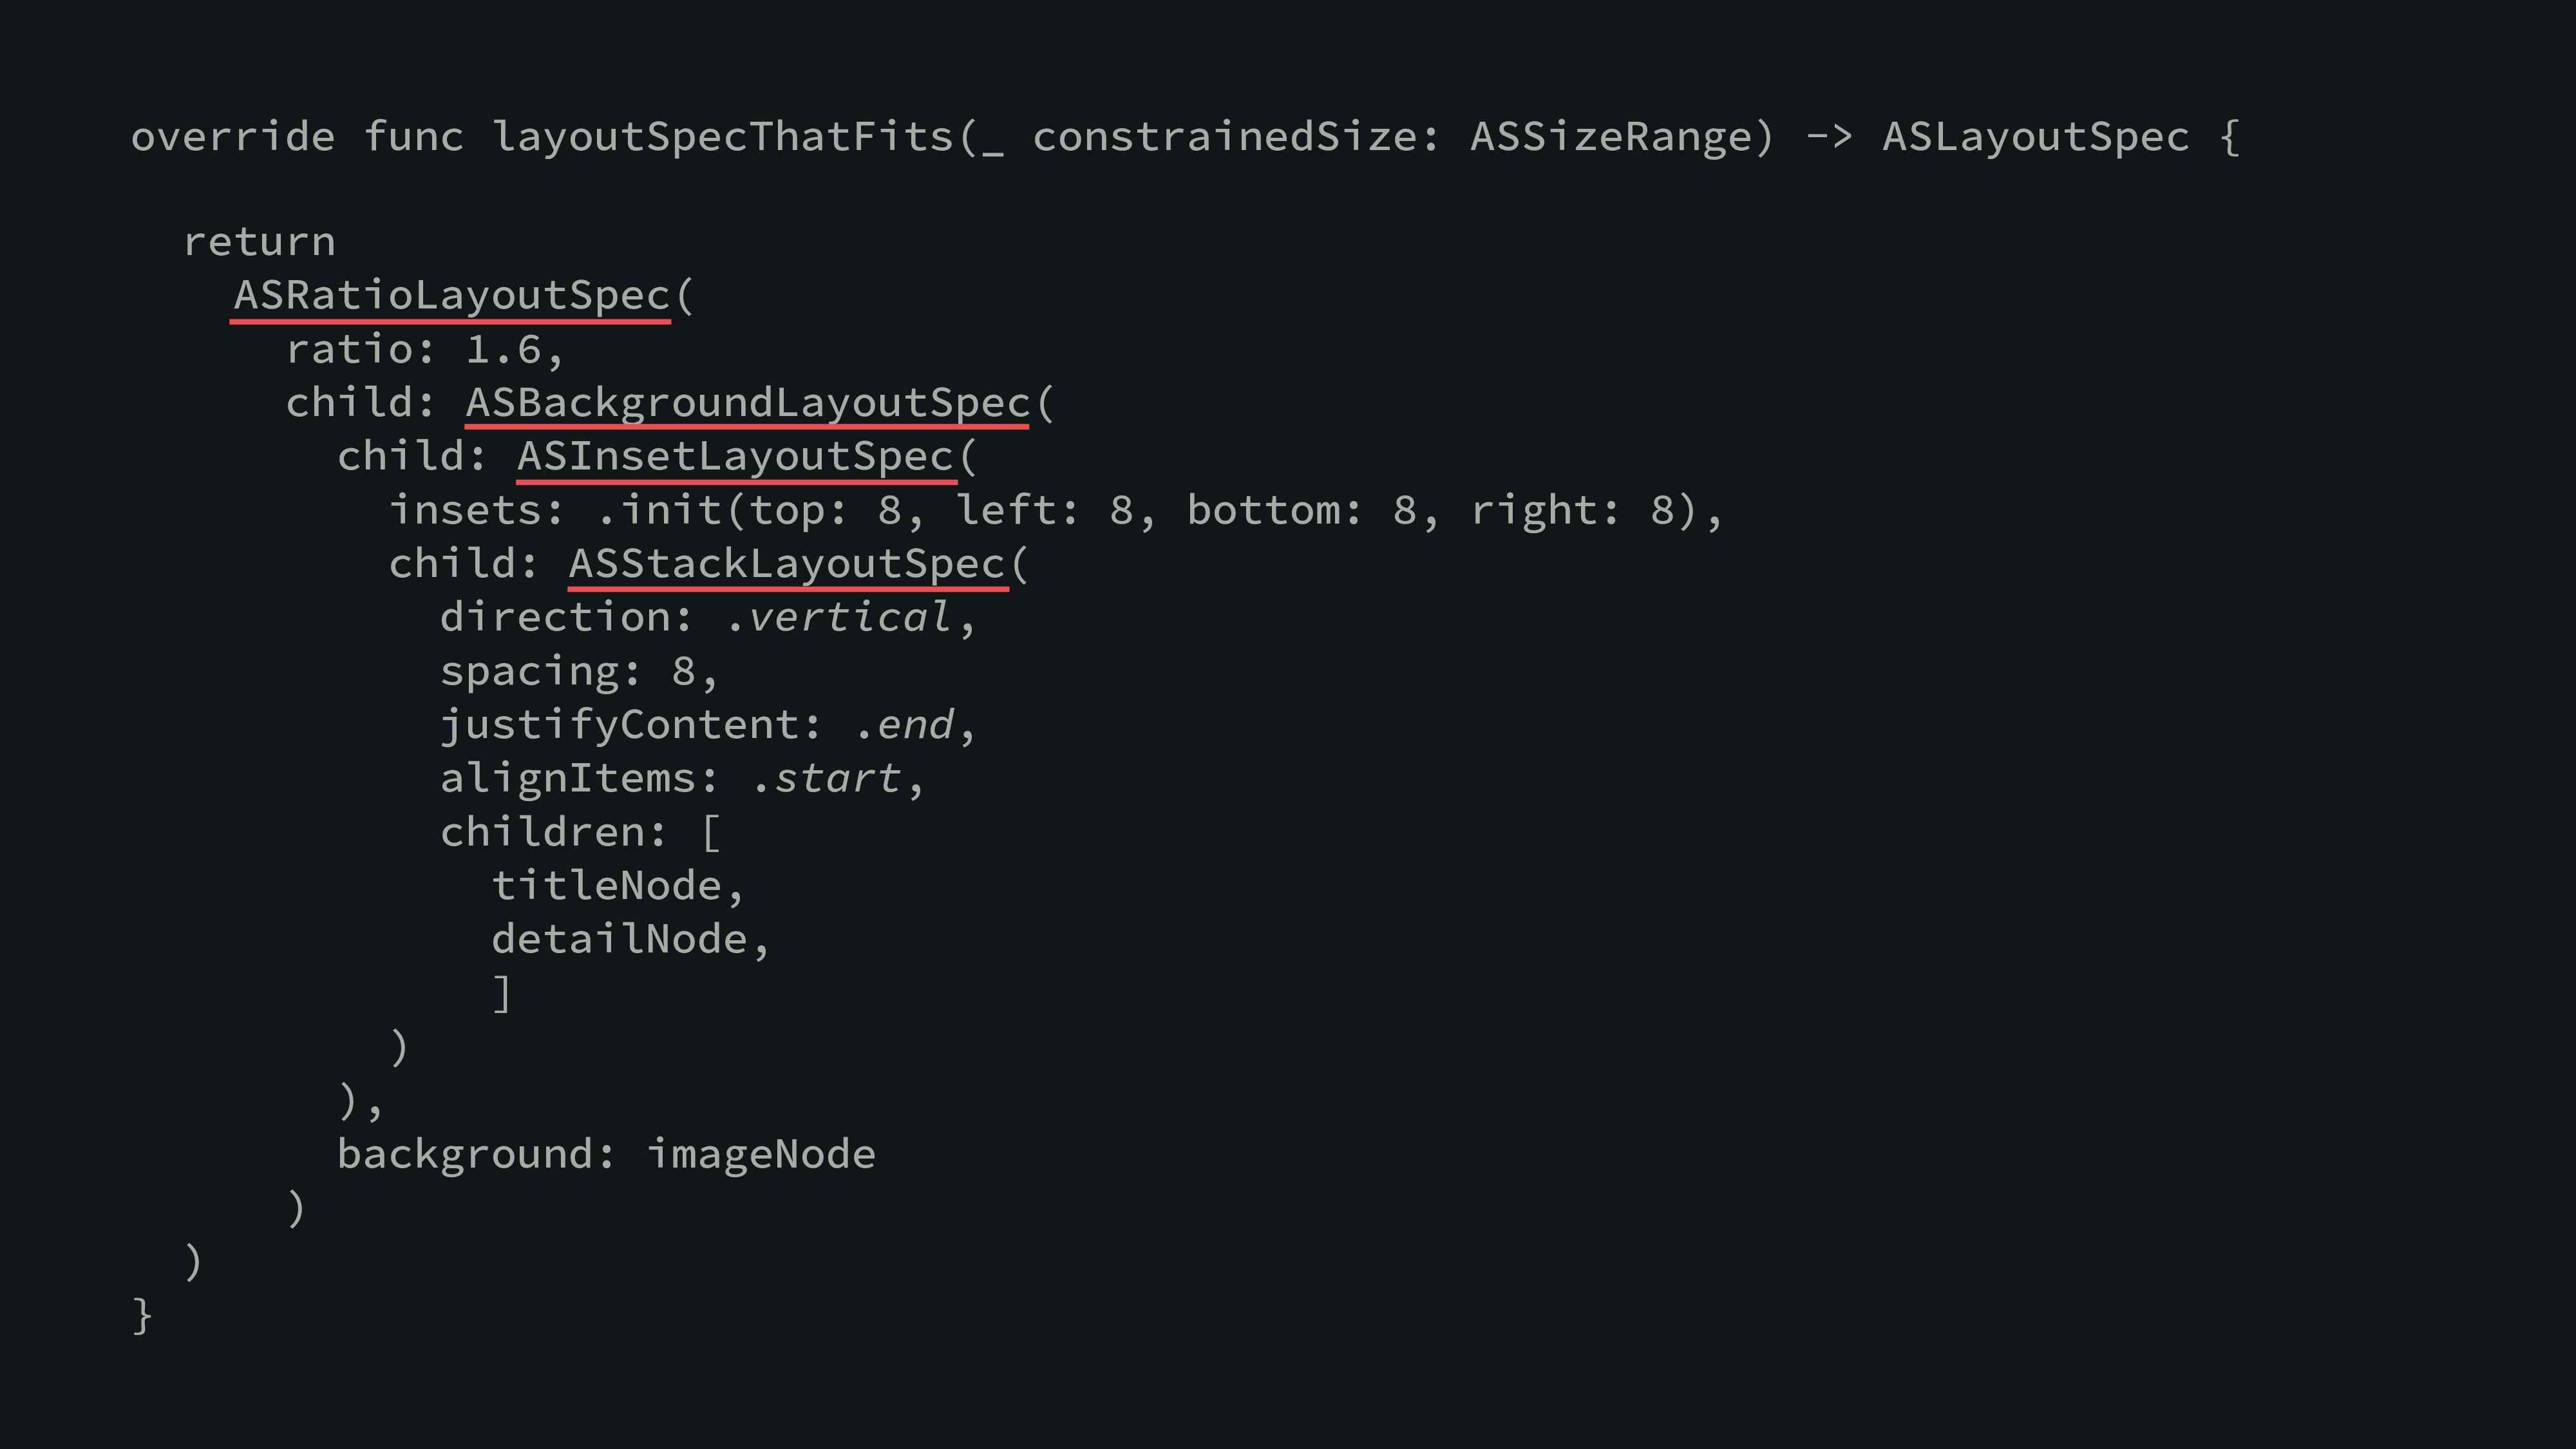 override func layoutSpecThatFits(_ constrainedS...